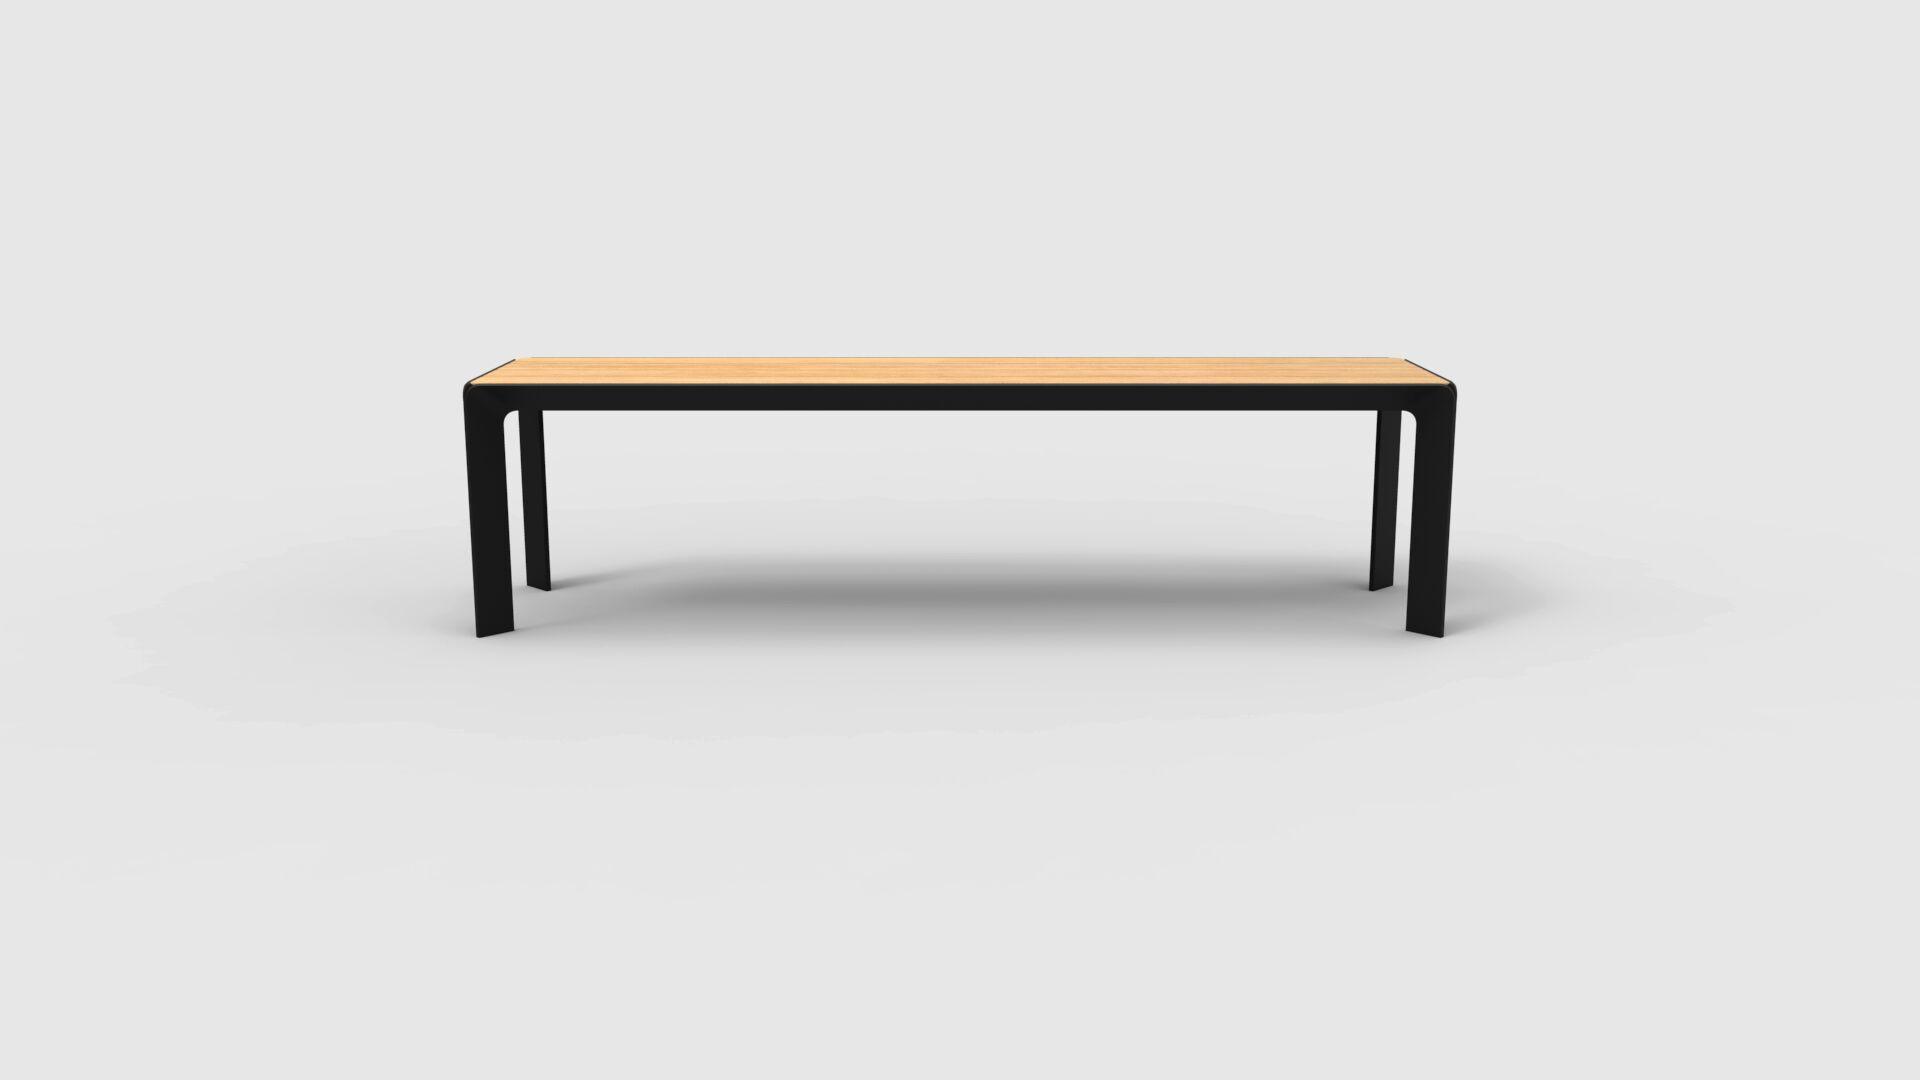 Gallery Of Arucs Bench Local Australian Industrial Design & Outdoor Furniture Brisbane, Qld Image 2